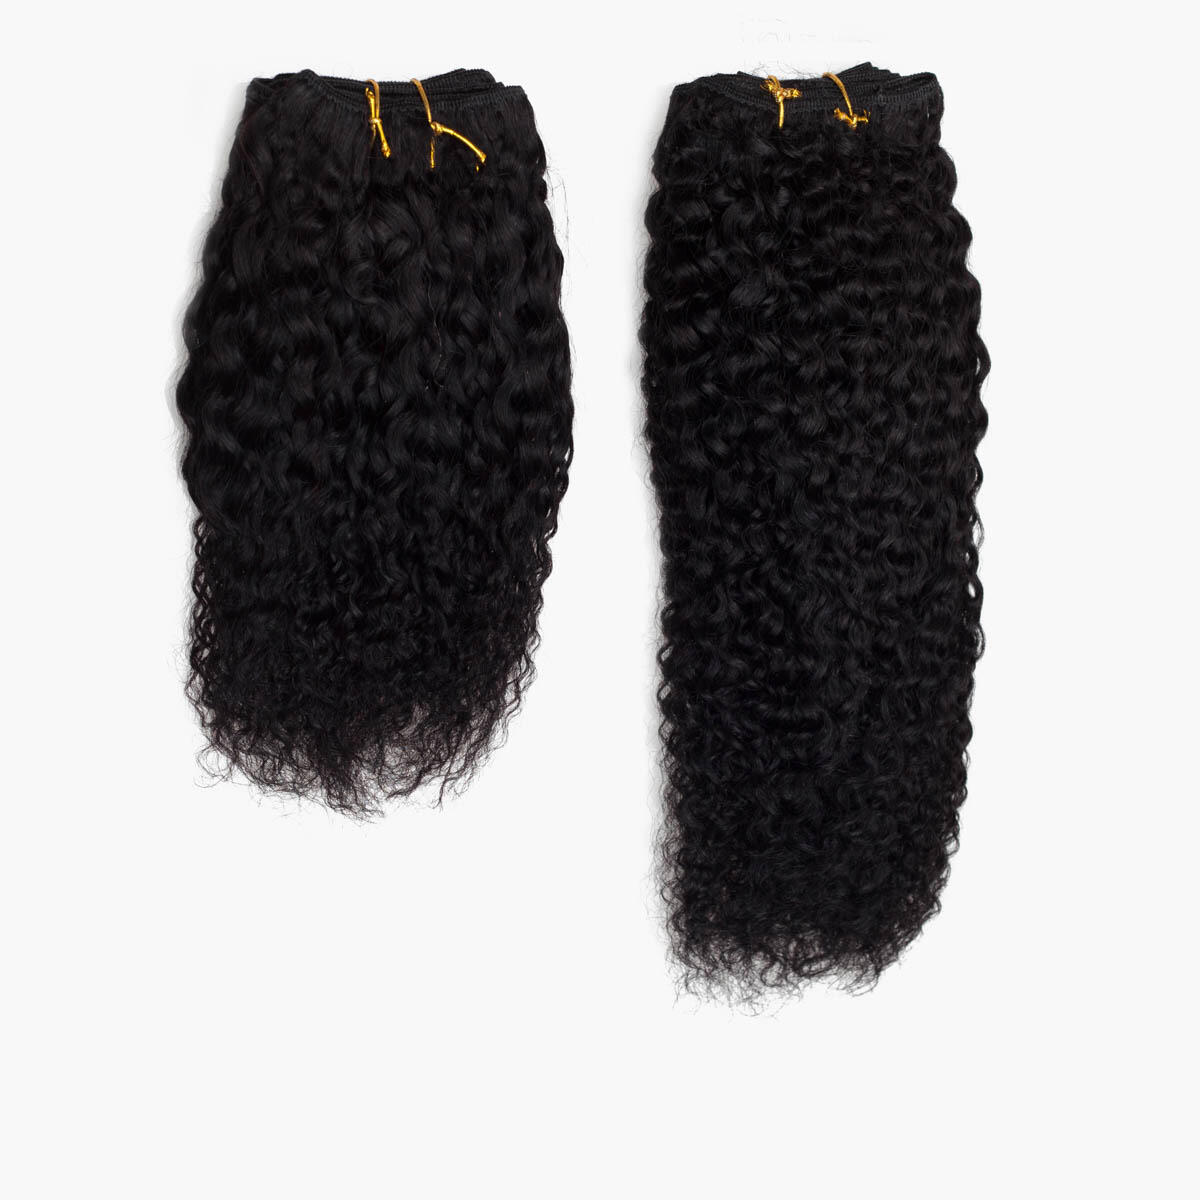 Hair Weft Coily Curl 1.0 Black 25 cm